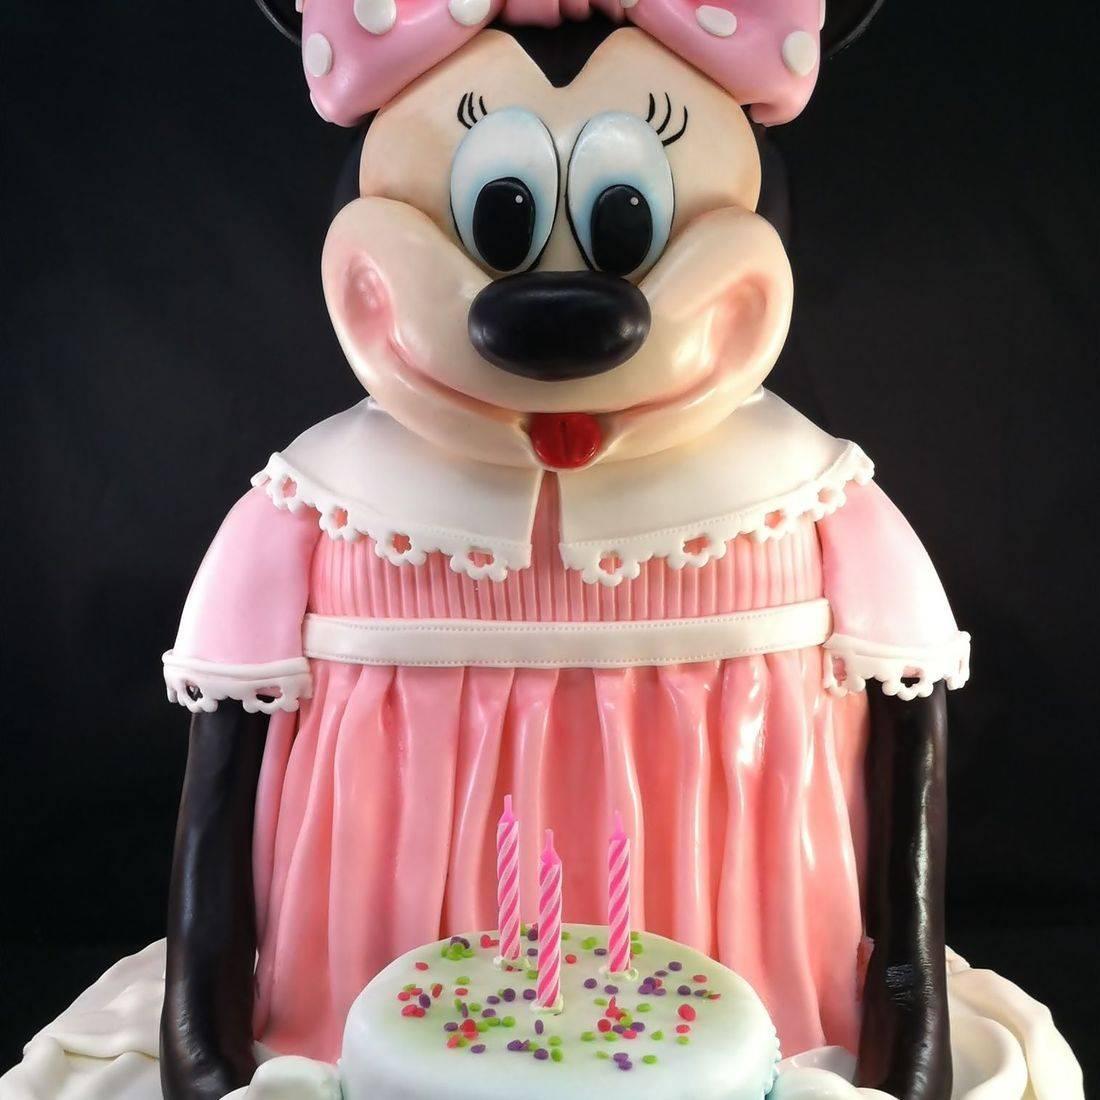 MInnie Mouse Birthday  Cake Carved Dimensional Cake Milwaukee